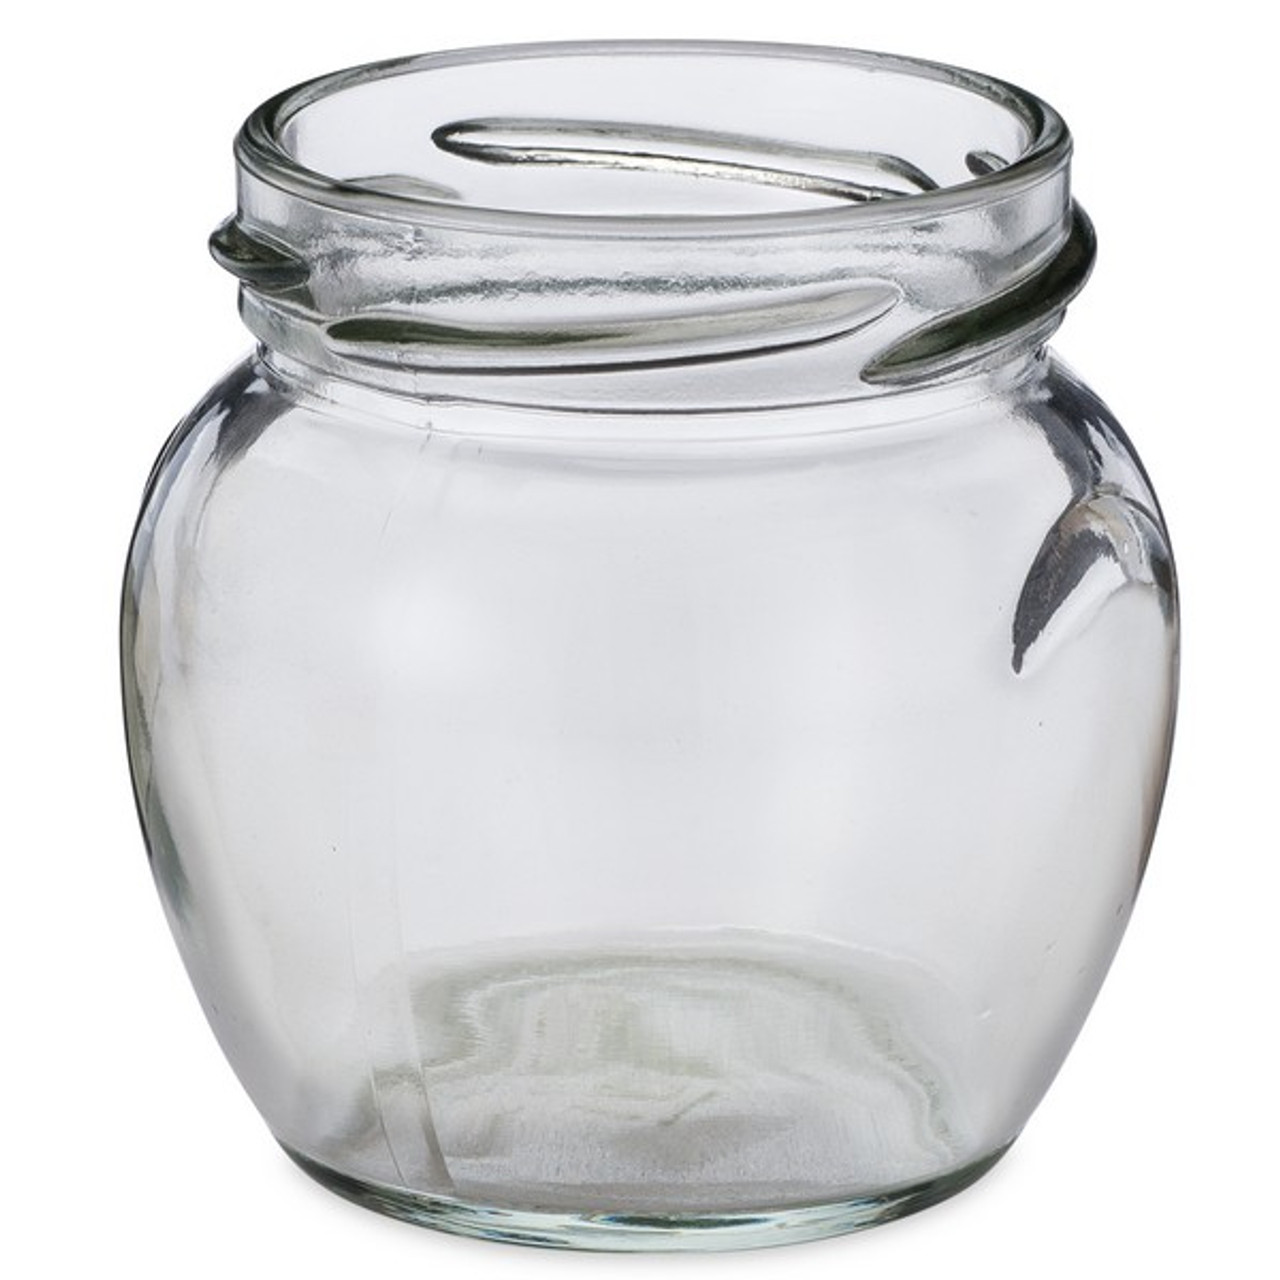 3 oz clear glass honey pot jars cap not included berlin. Black Bedroom Furniture Sets. Home Design Ideas